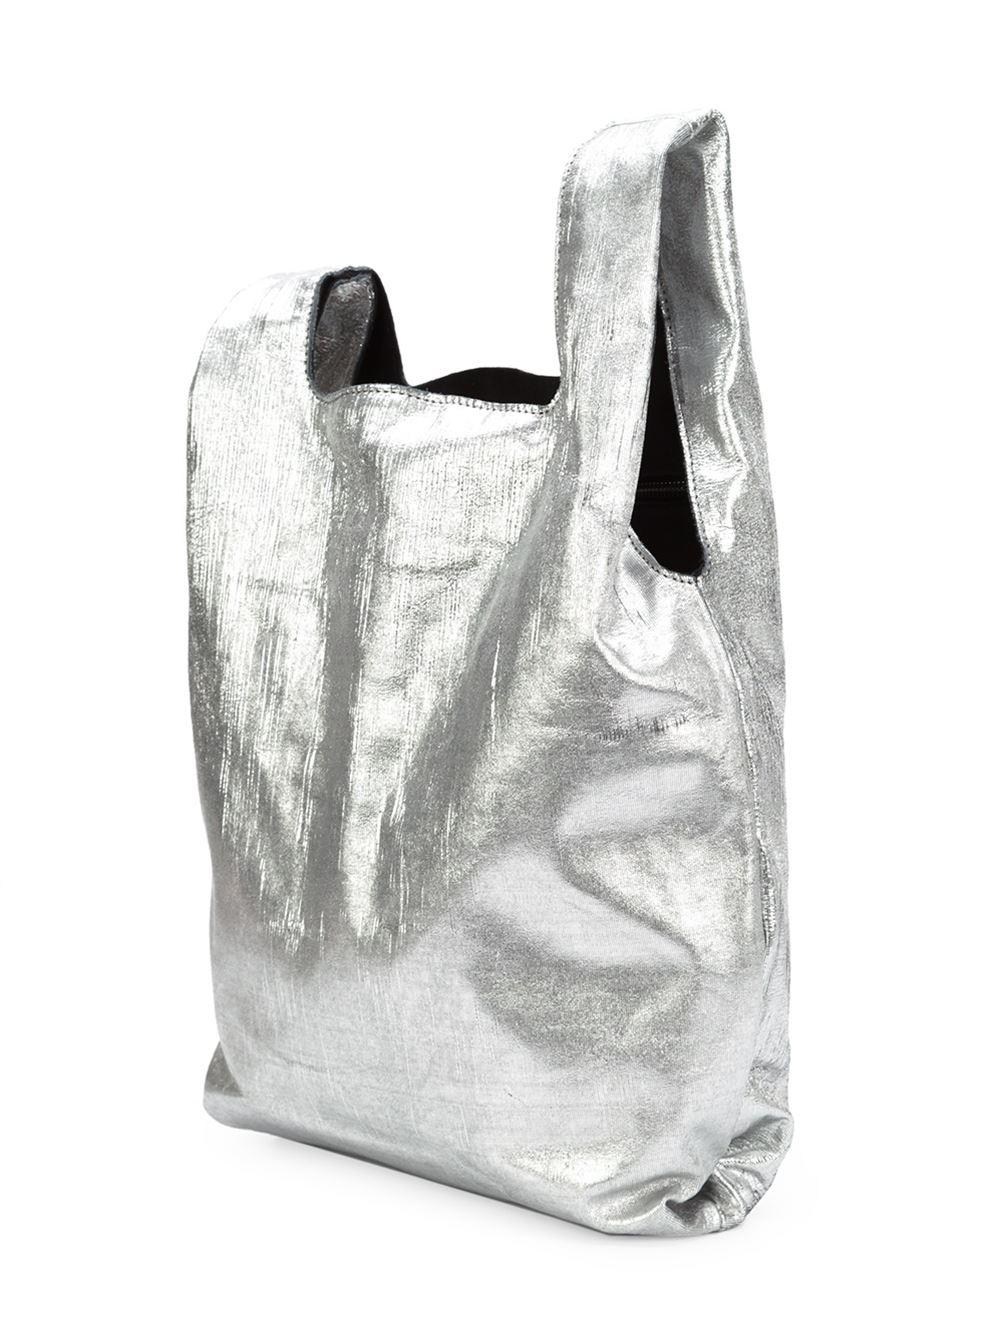 Maison Margiela Distressed Shopping Bag $1,390.